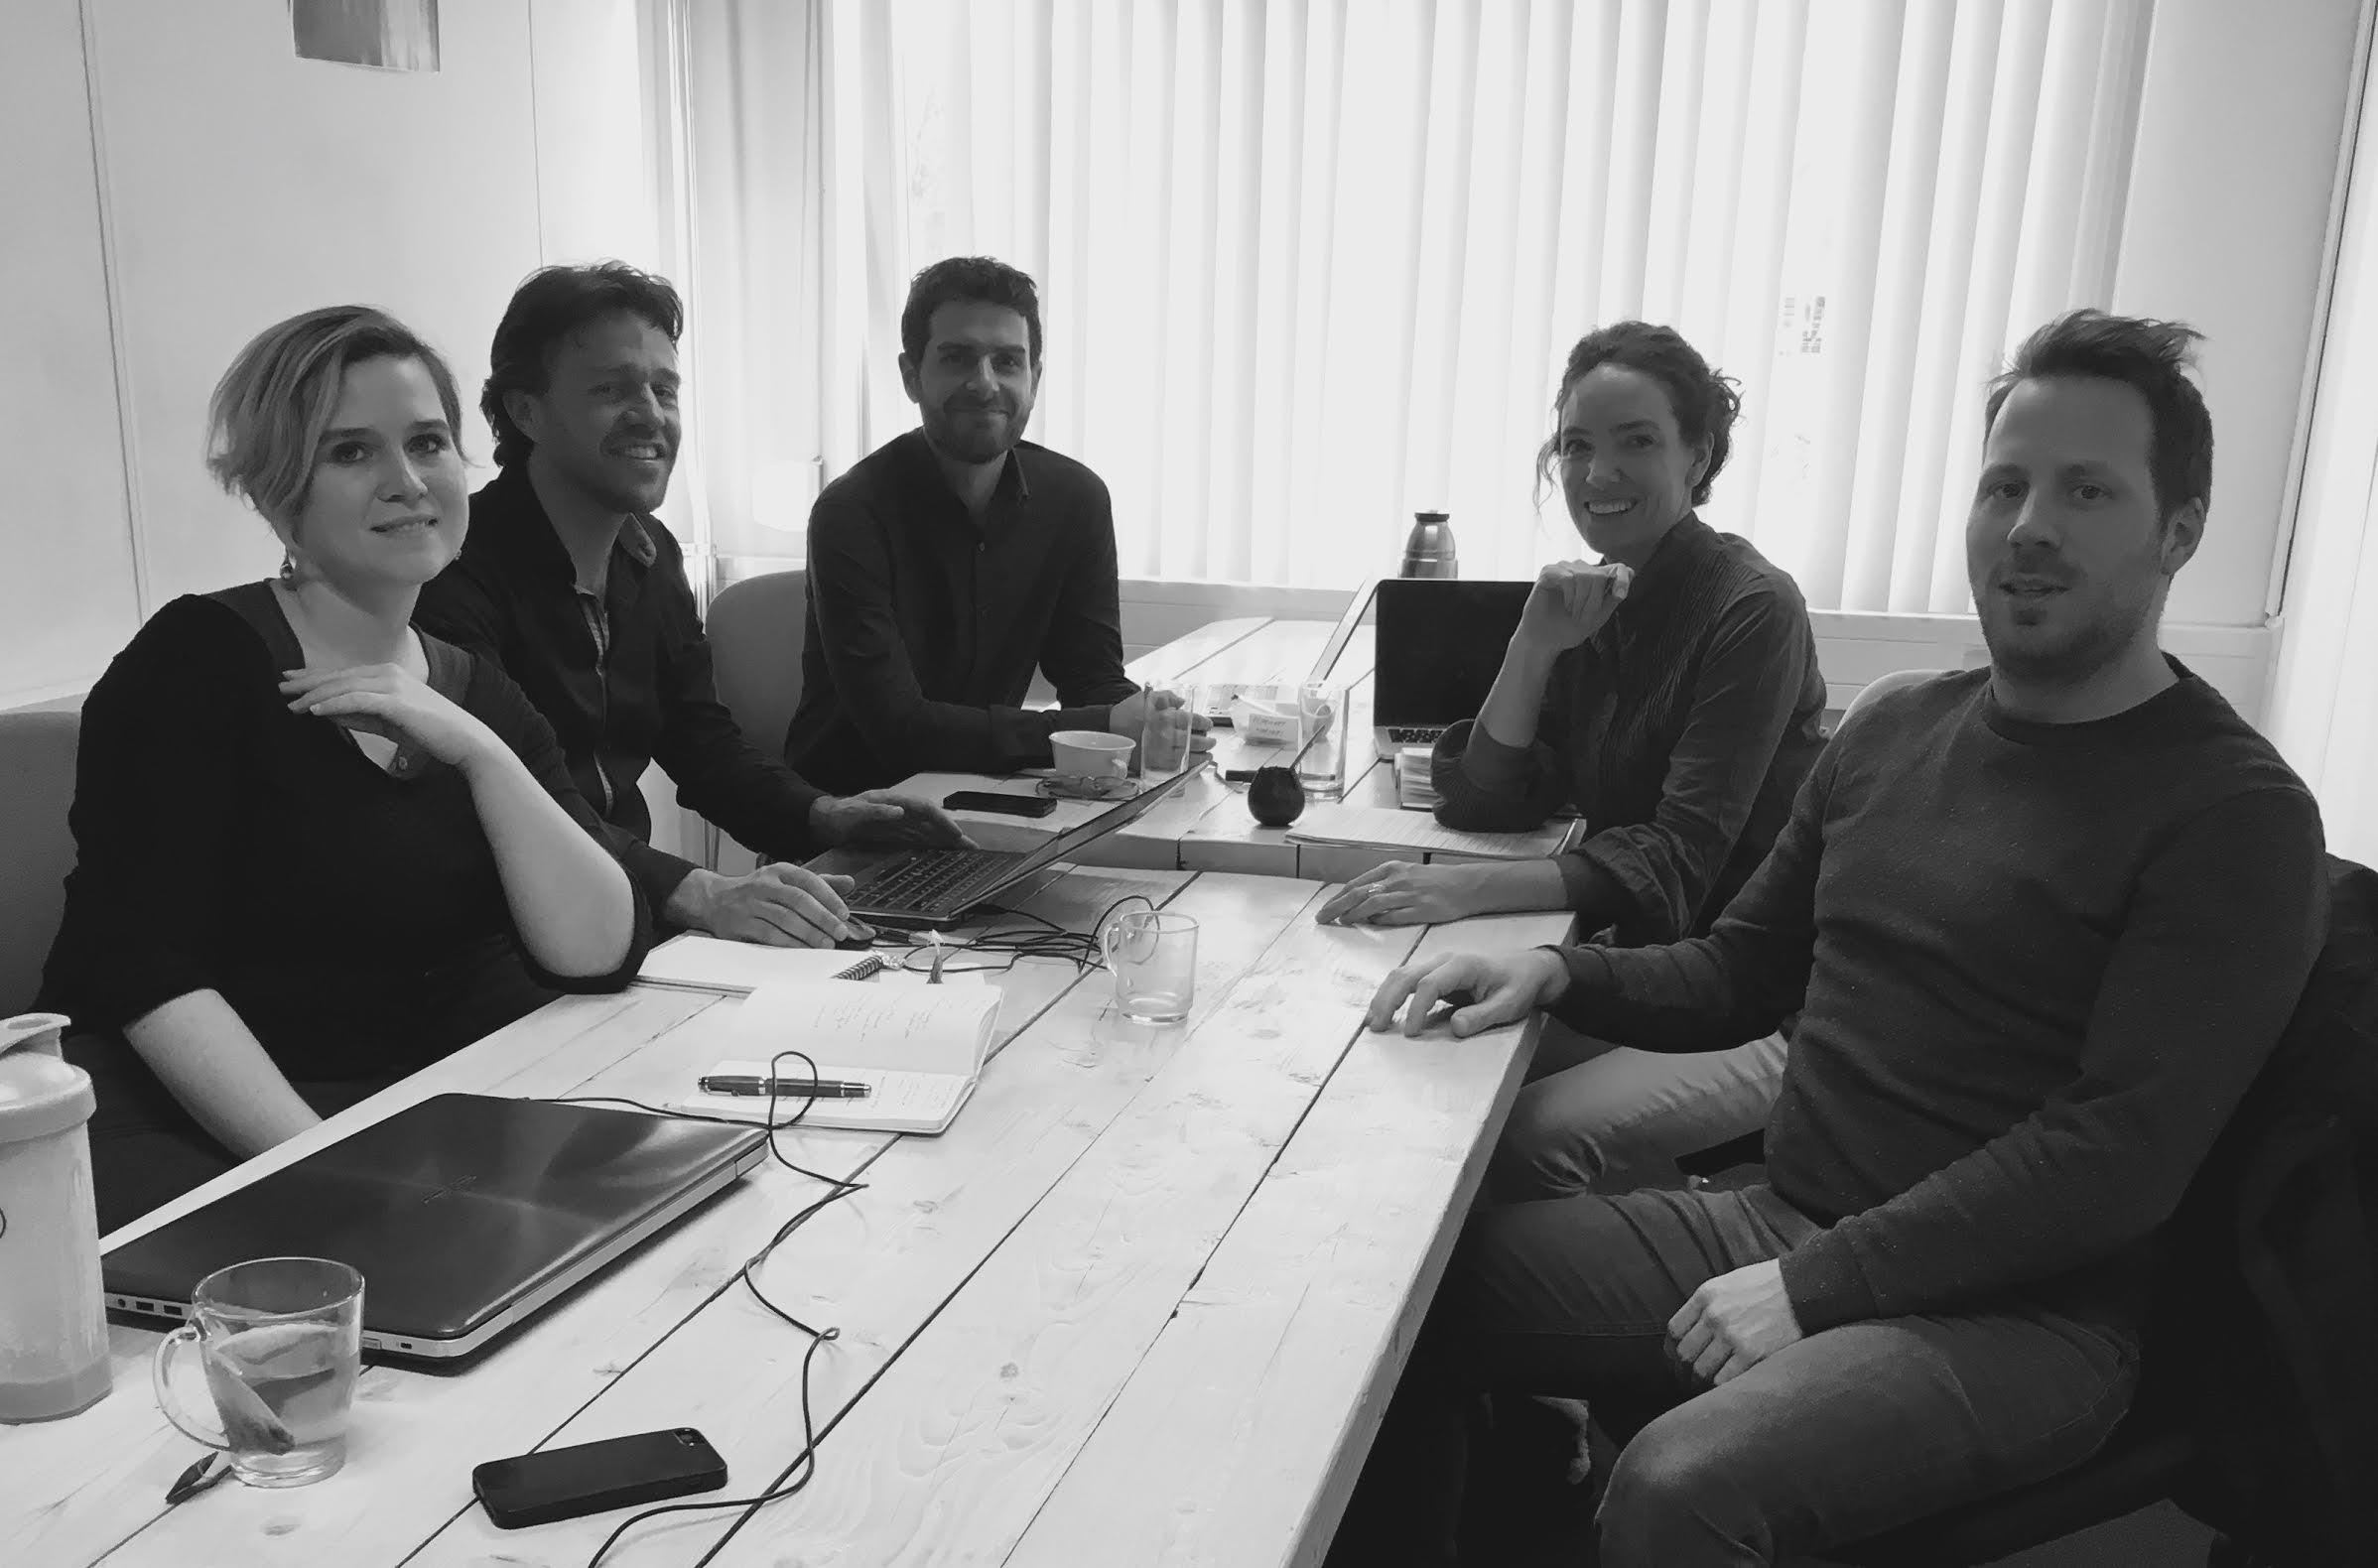 meeting SM-Metabolic-Goood - ARG-NL city embassy